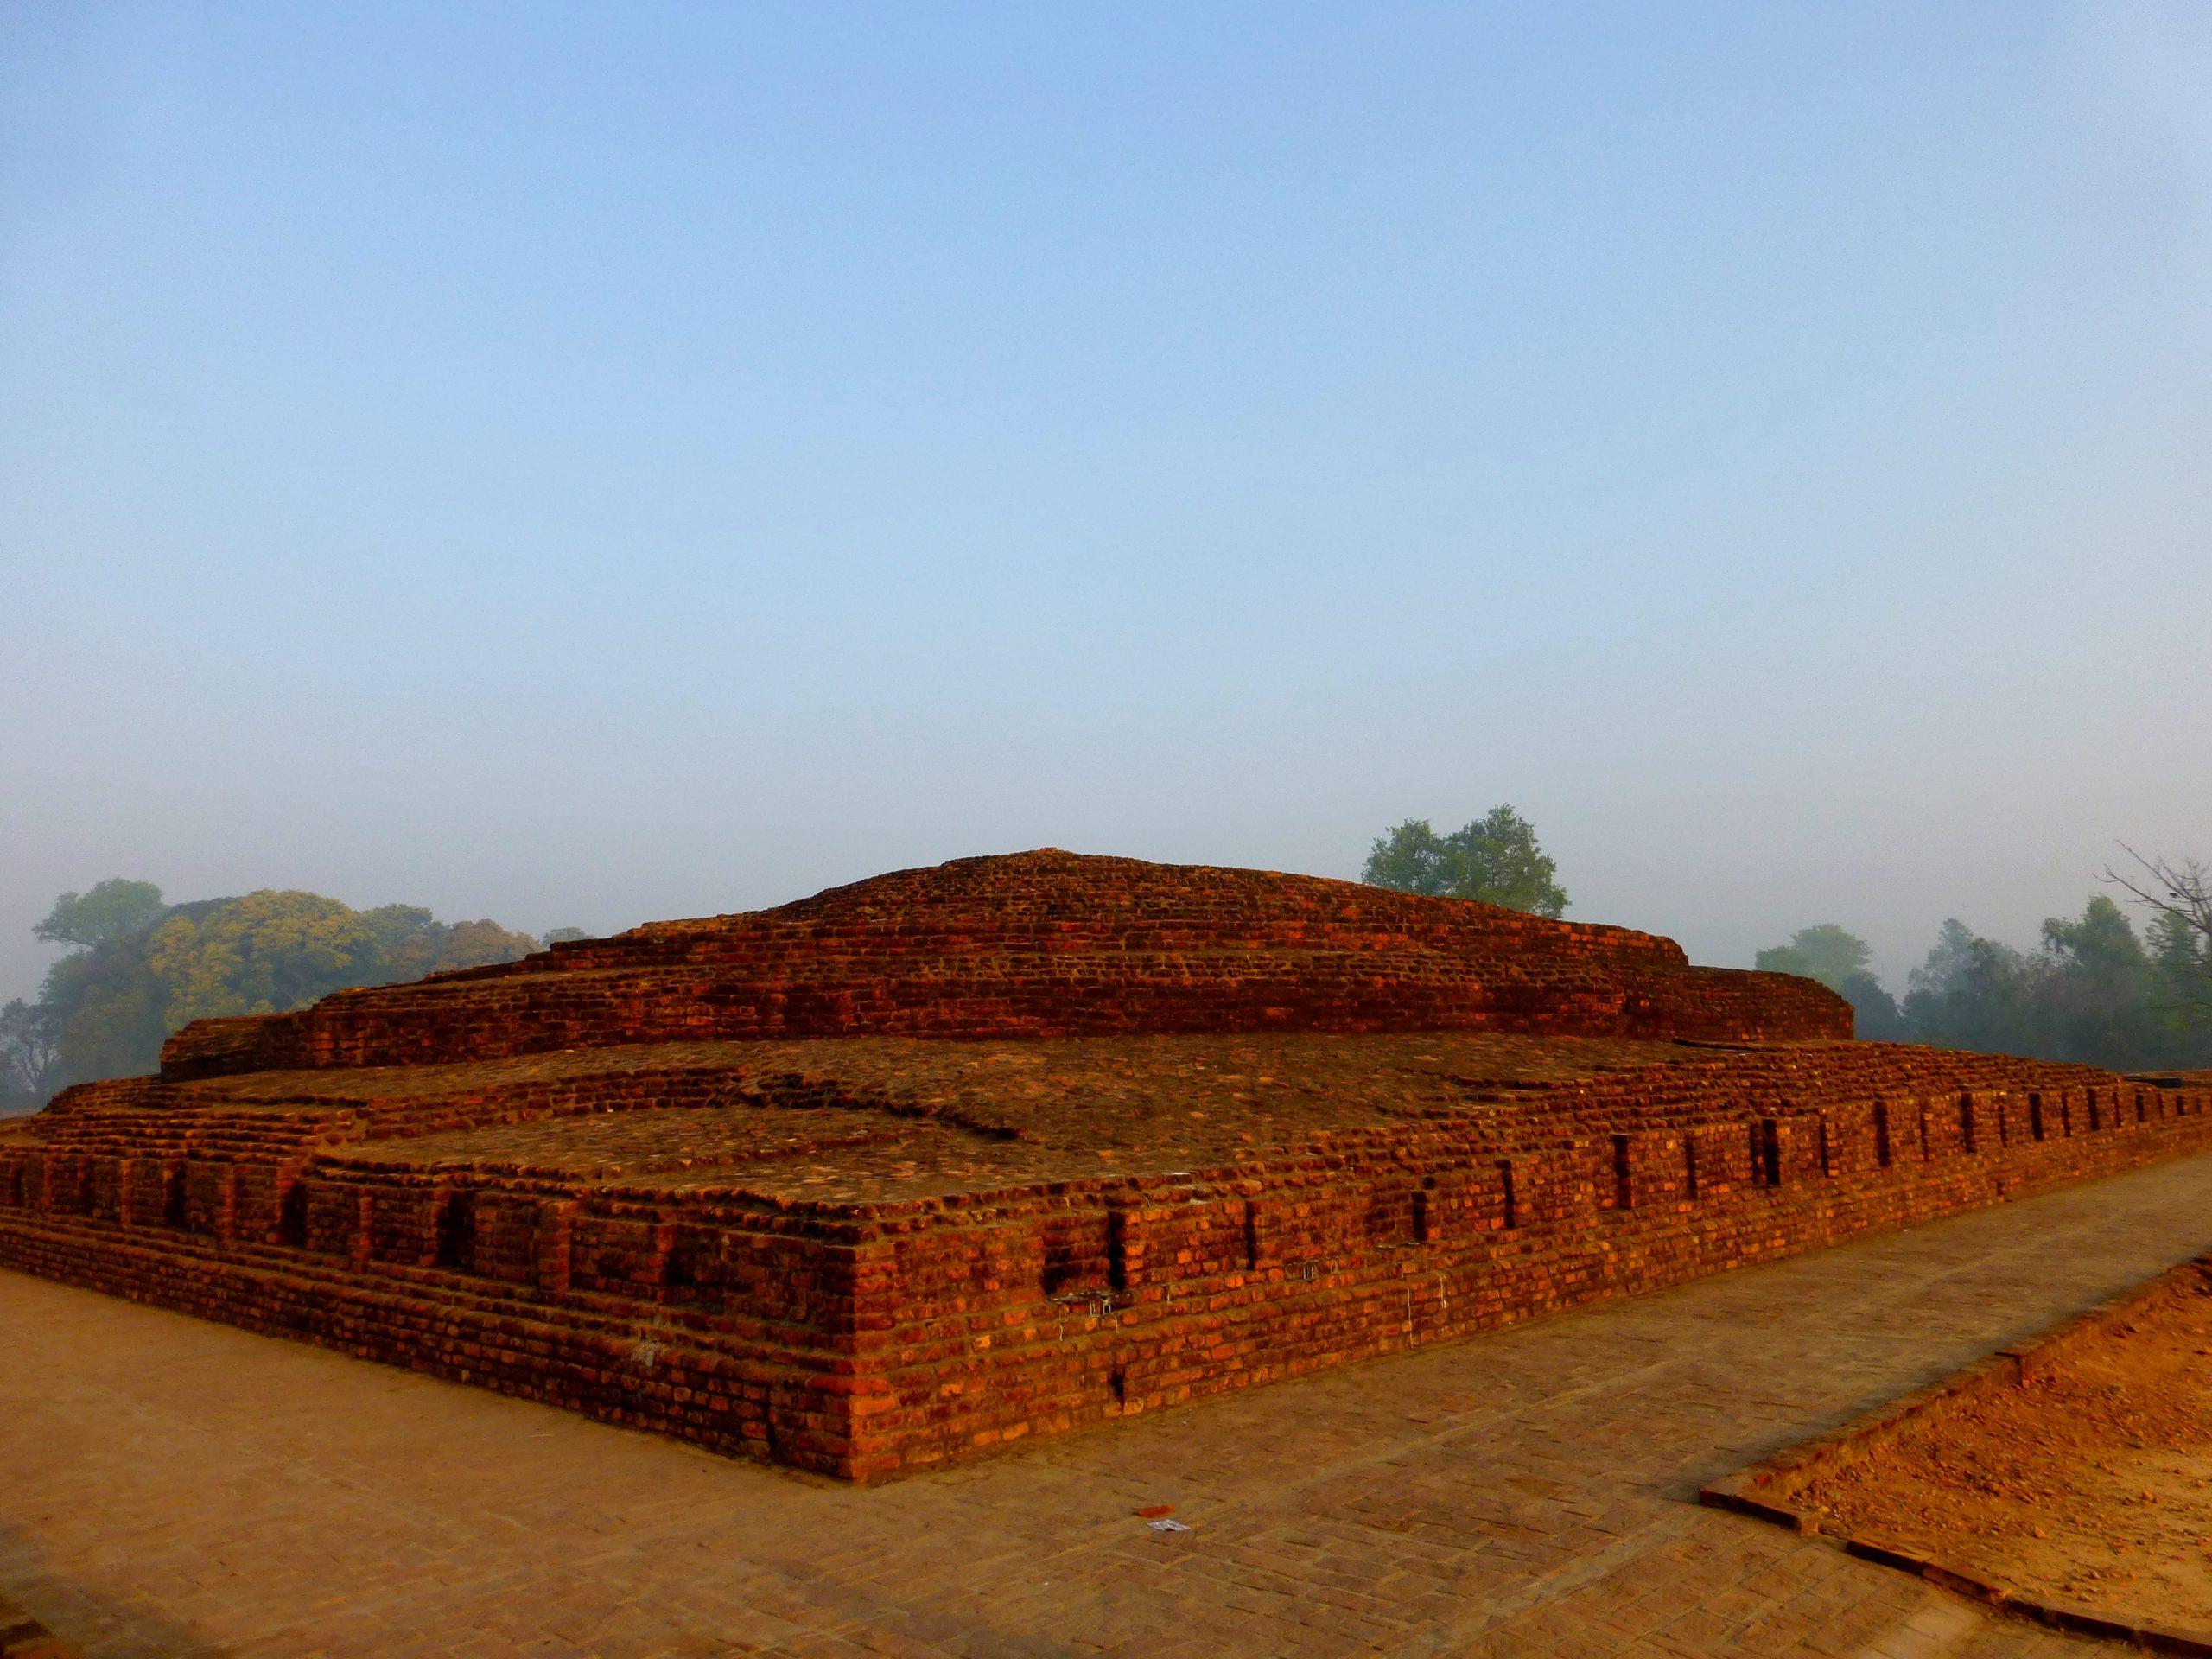 Visit Kapilvastu - Home of Lord Gautama Buddha|Uttar Pradesh Tourism